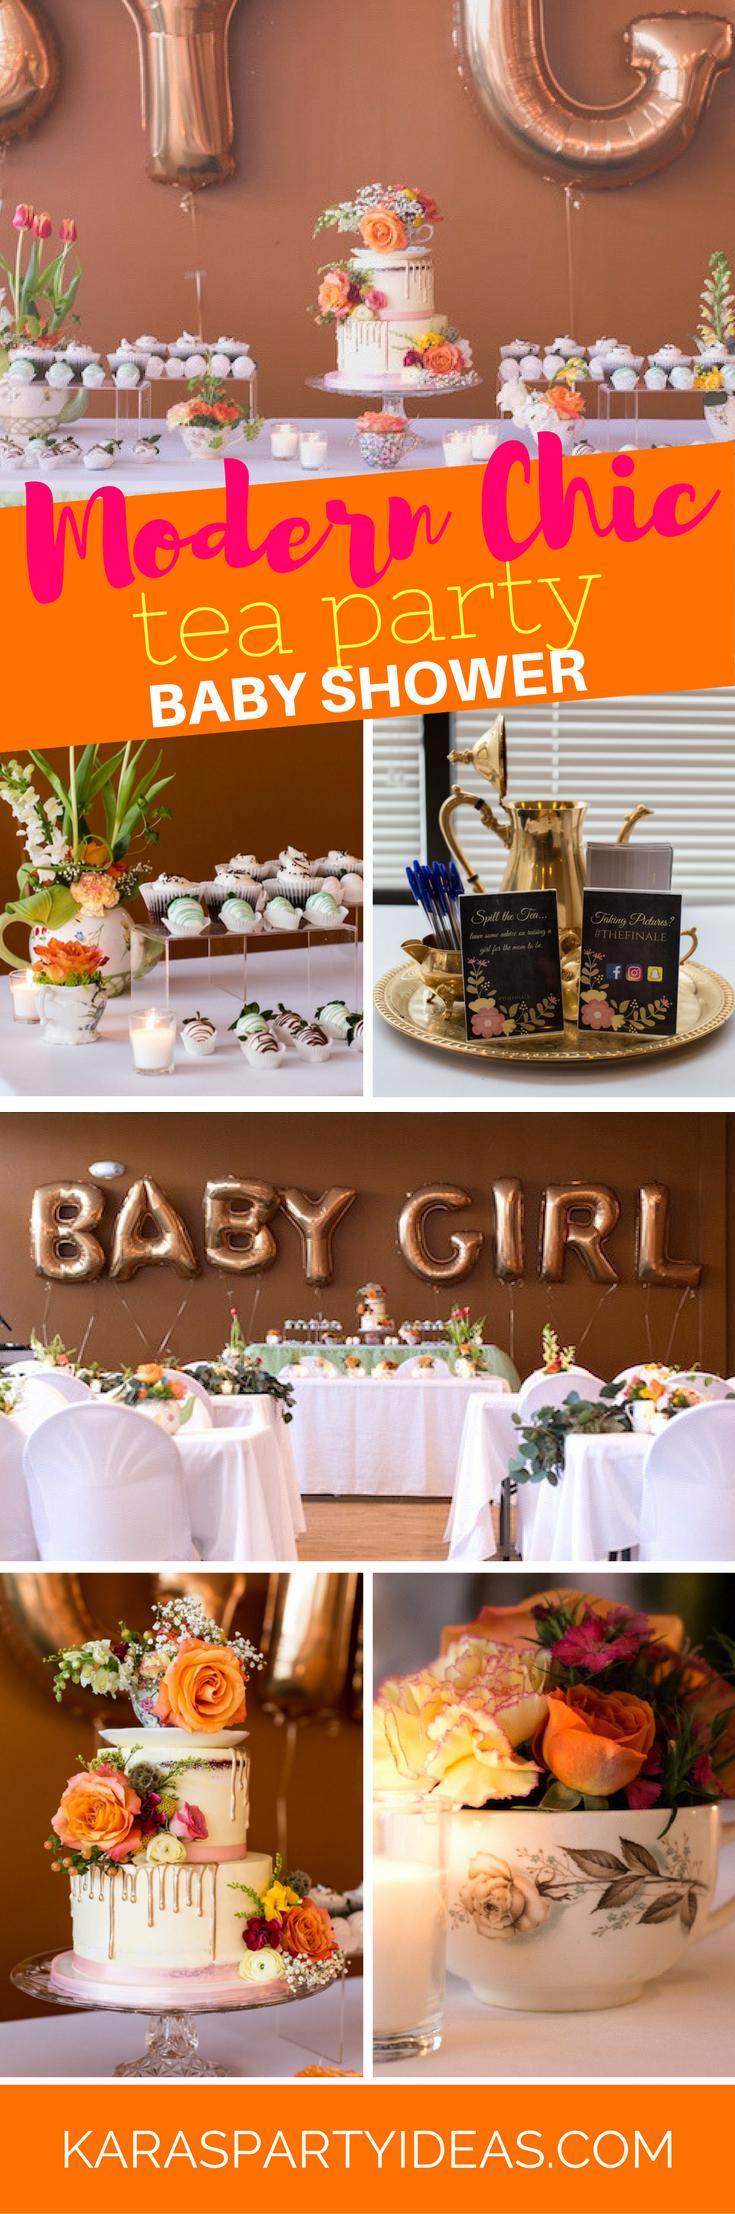 Modern Chic Tea Party Baby Shower via Kara's Party Ideas - KarasPartyIdeas.com